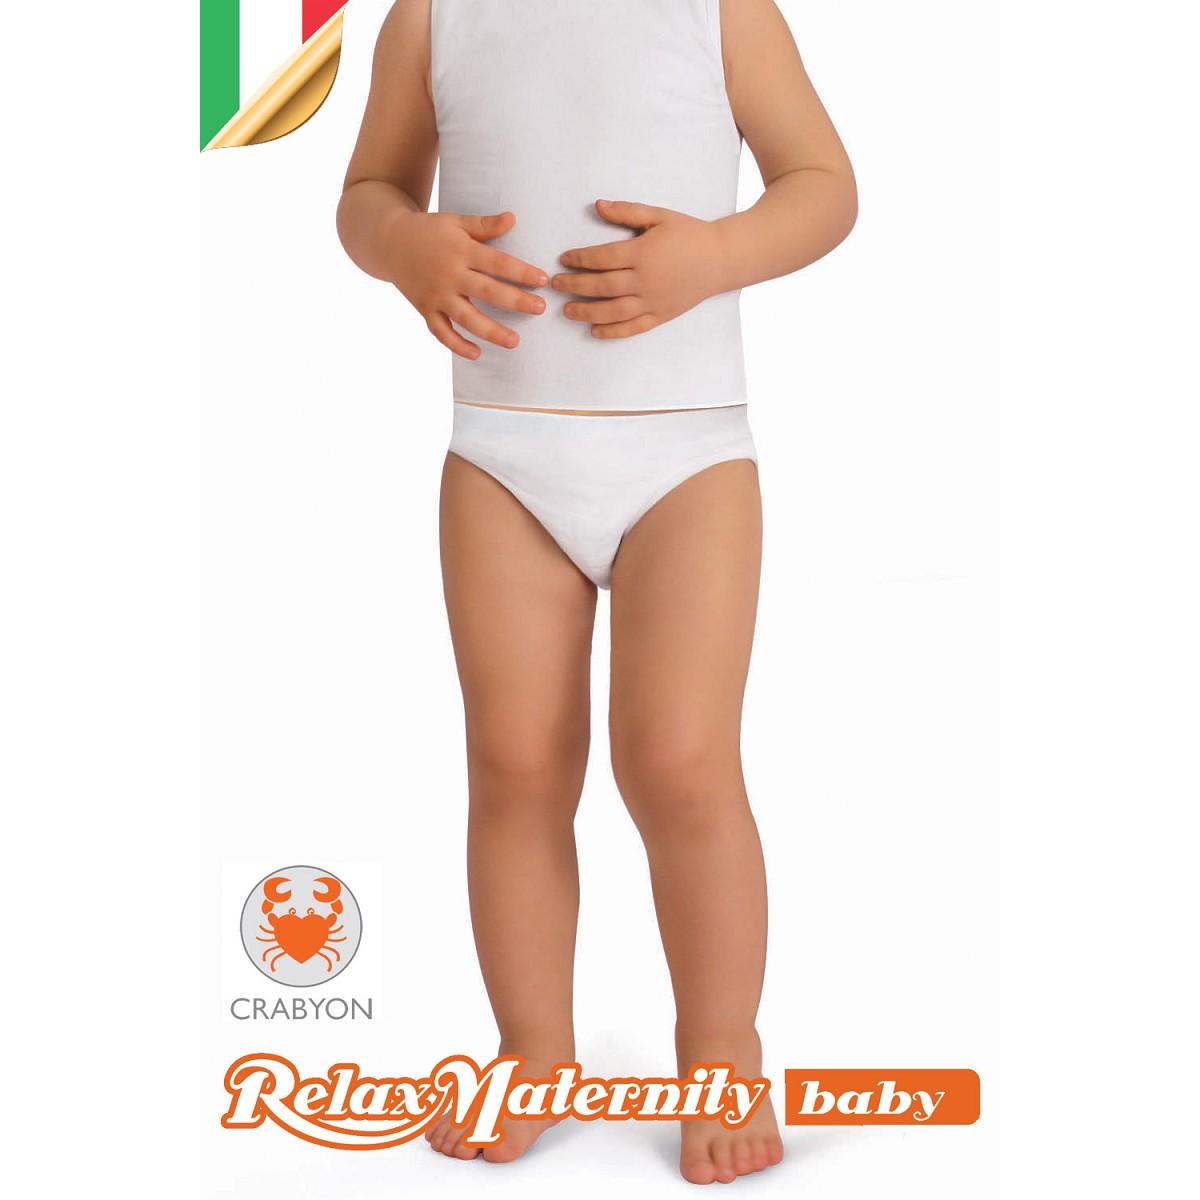 BODY CANOTTA BAMBINO CRABYON RelaxMaternity Baby INTIMO BIMBI 6-36 MESI NEONATO